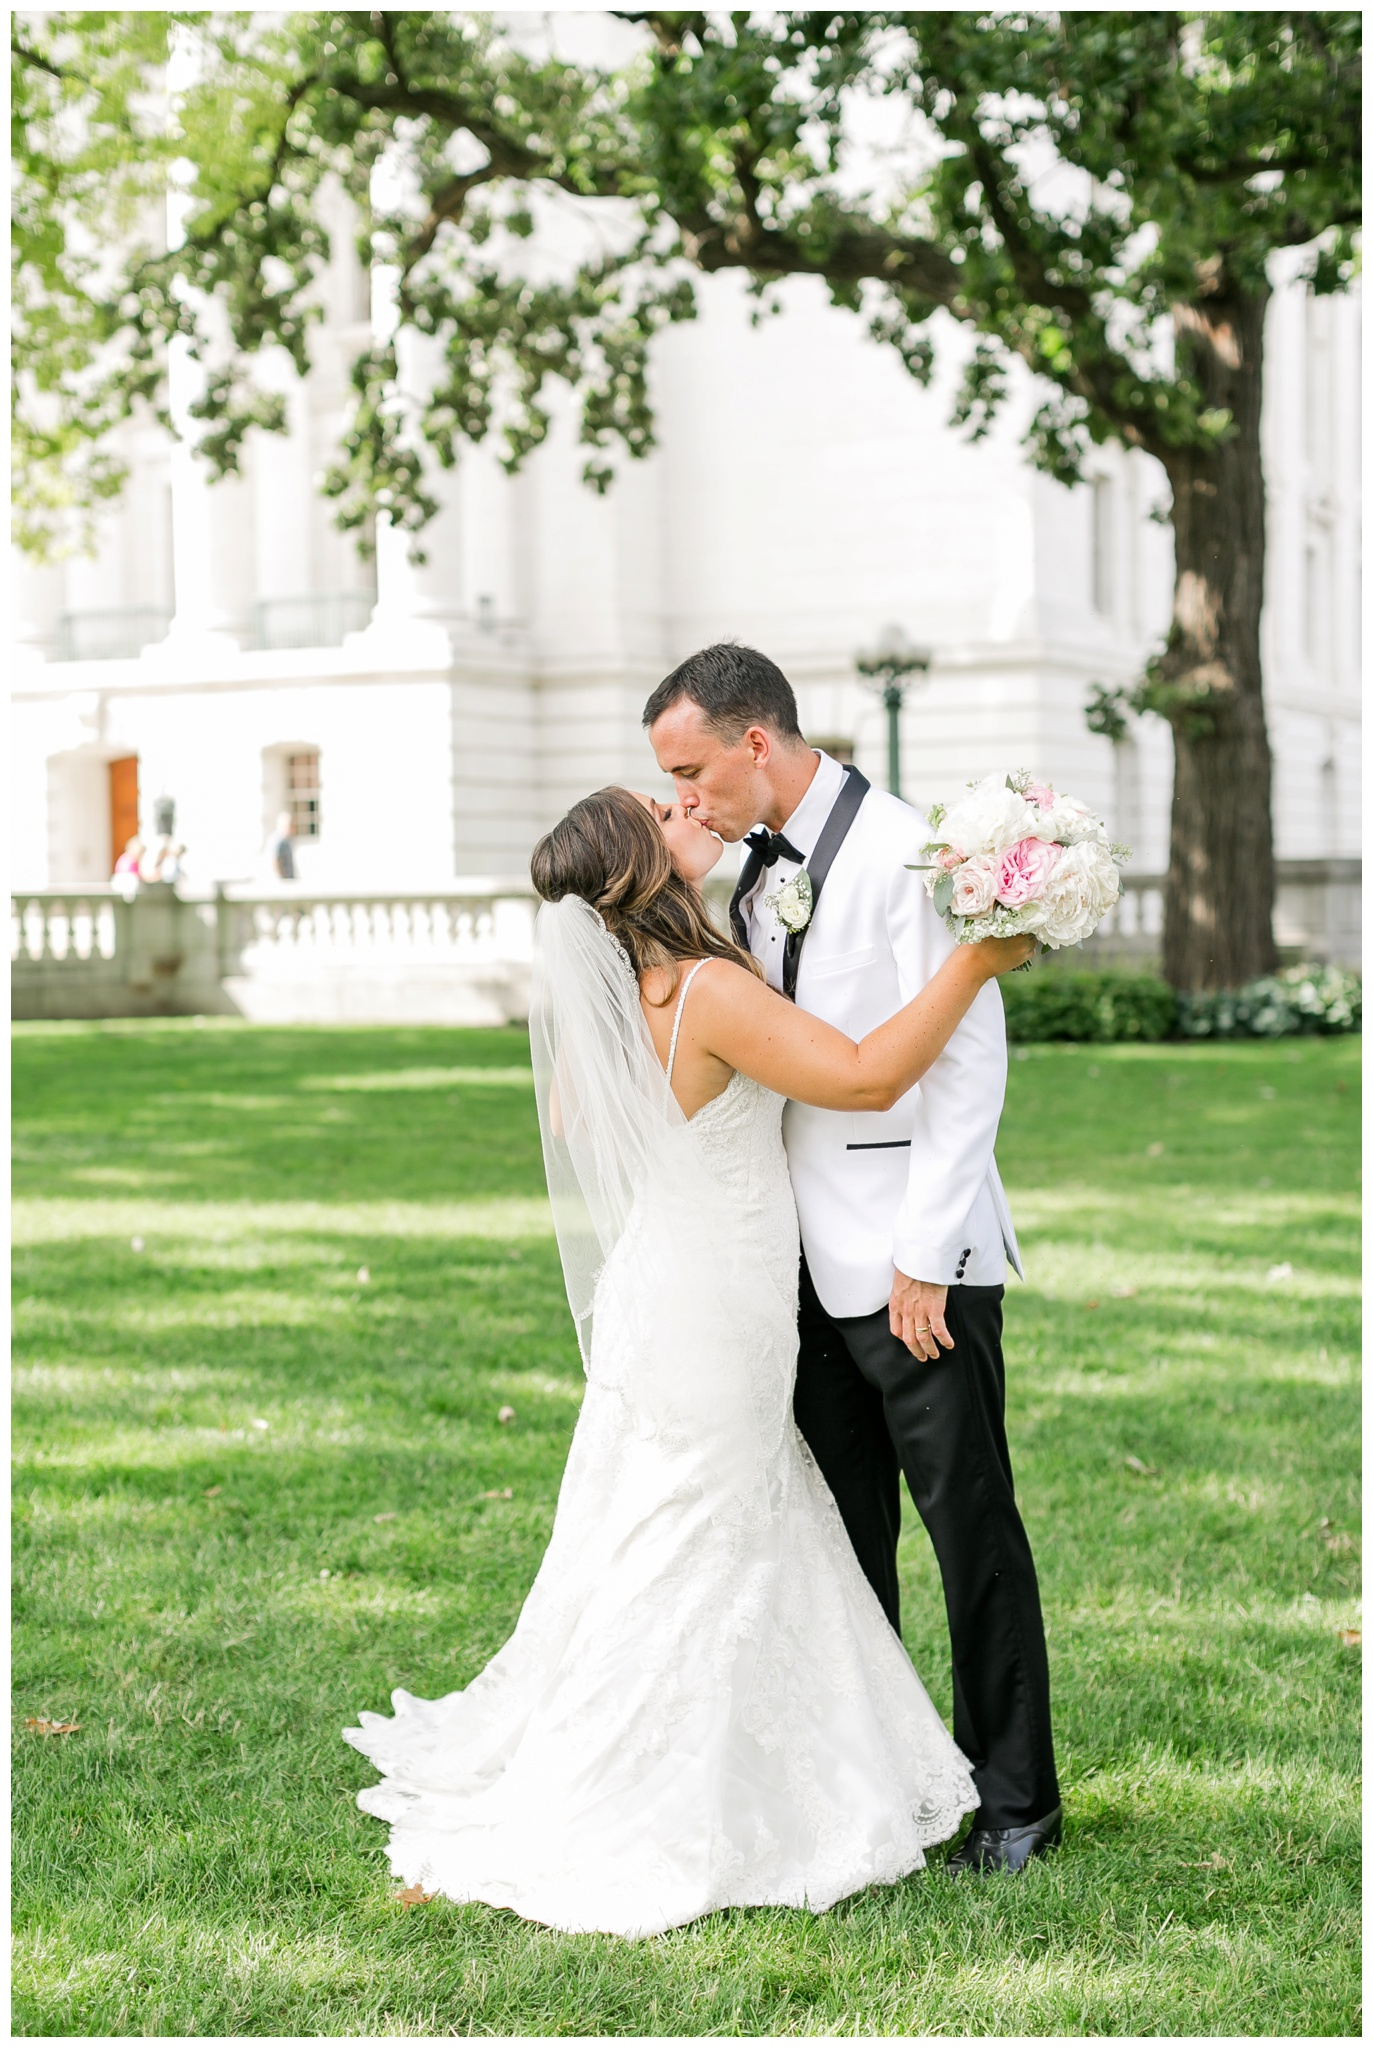 UW_Memorial_Union_wedding_madison_wisconsin_wedding_photographers_4624.jpg